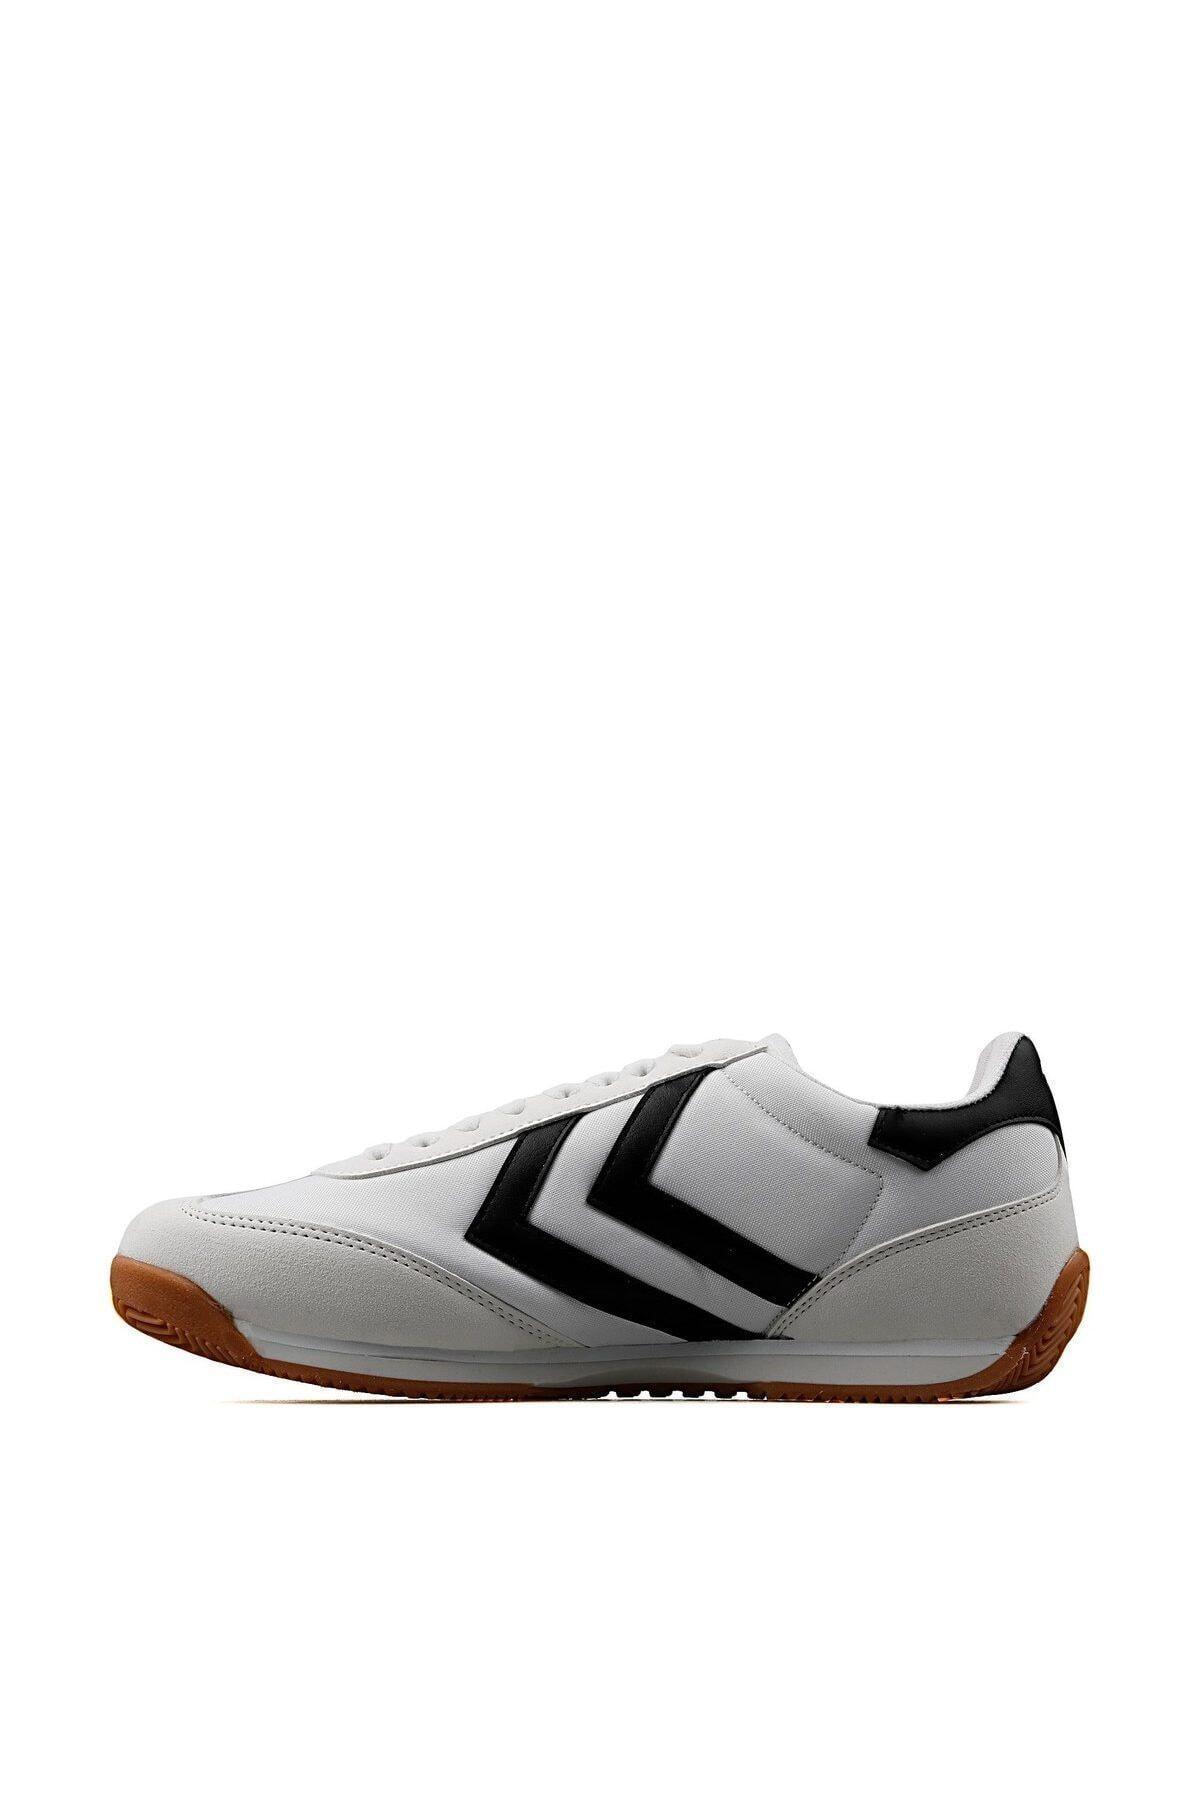 HUMMEL STADION III LIFESTYLE SHO Beyaz Erkek Sneaker Ayakkabı 100584580 2